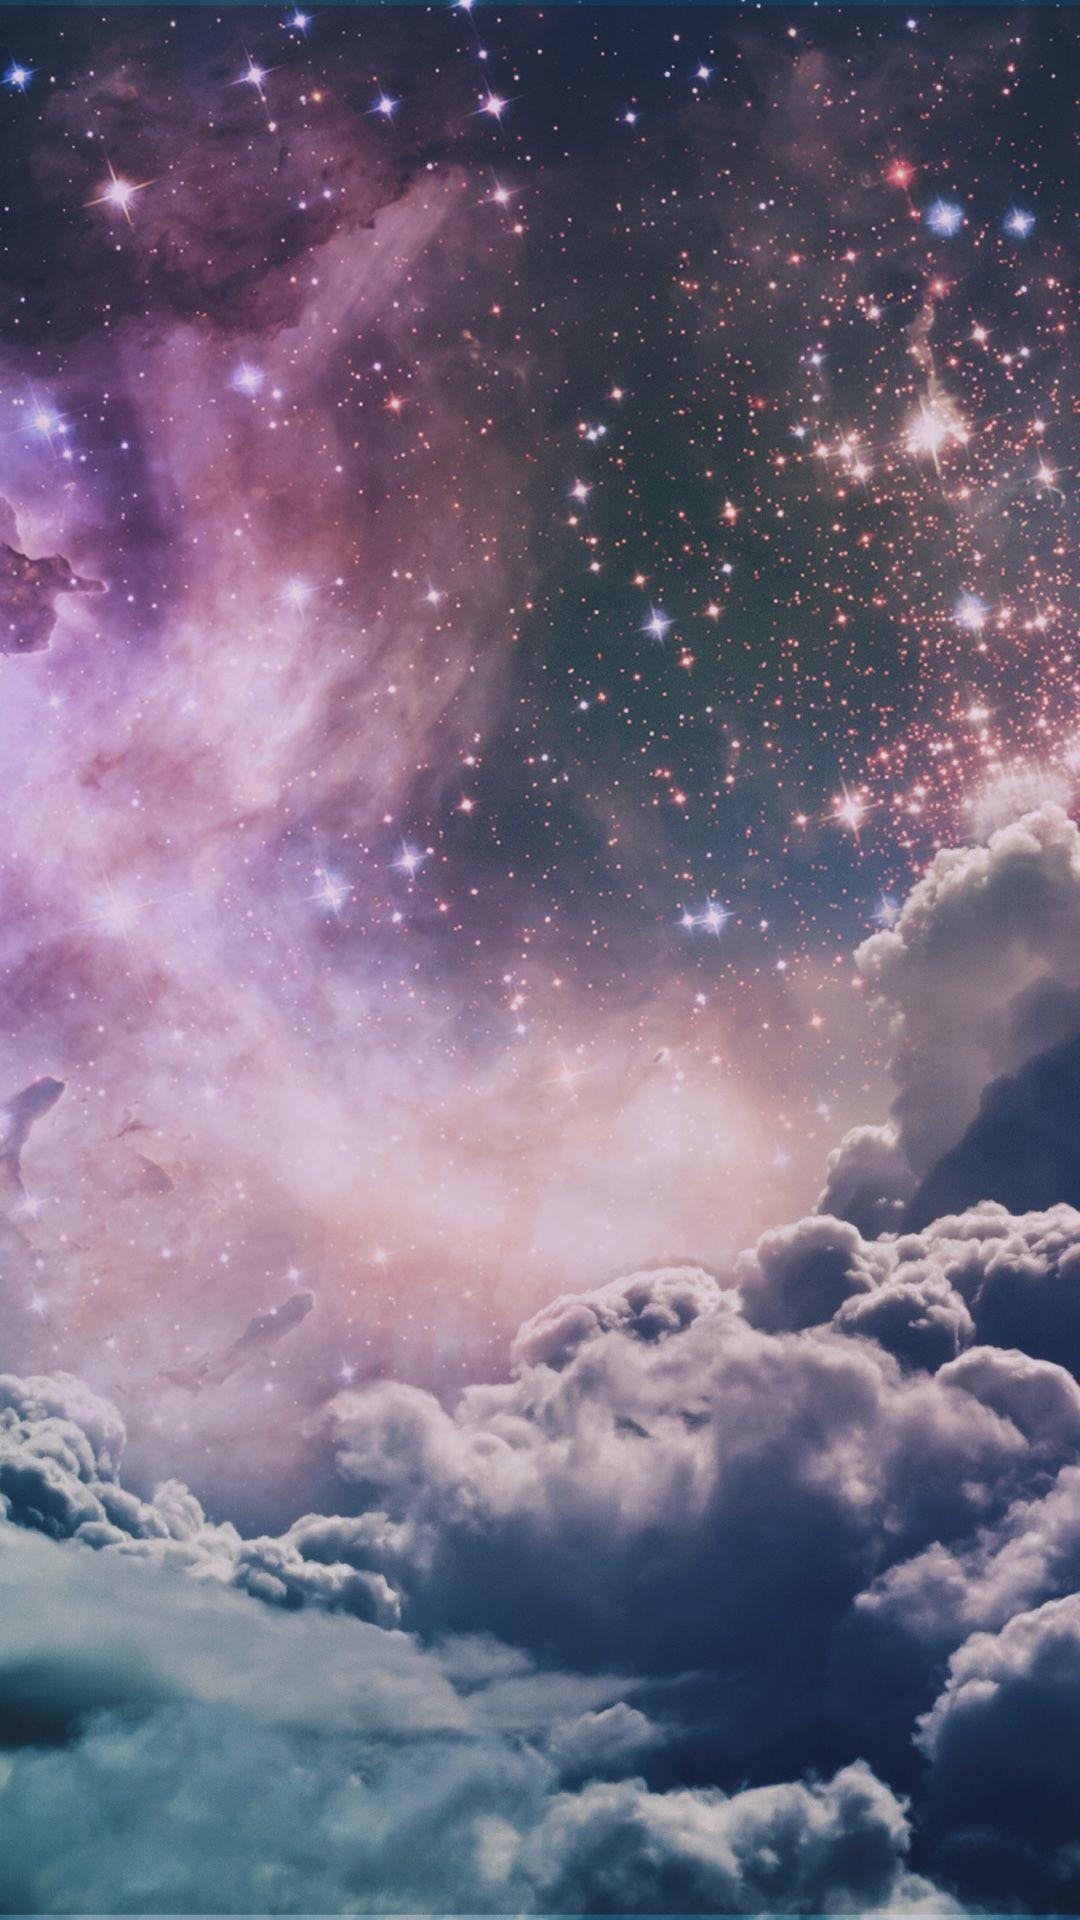 Magic Space Wallpaper Galaxy Wallpaper Iphone Galaxy Phone Wallpaper Cute Galaxy Wallpaper